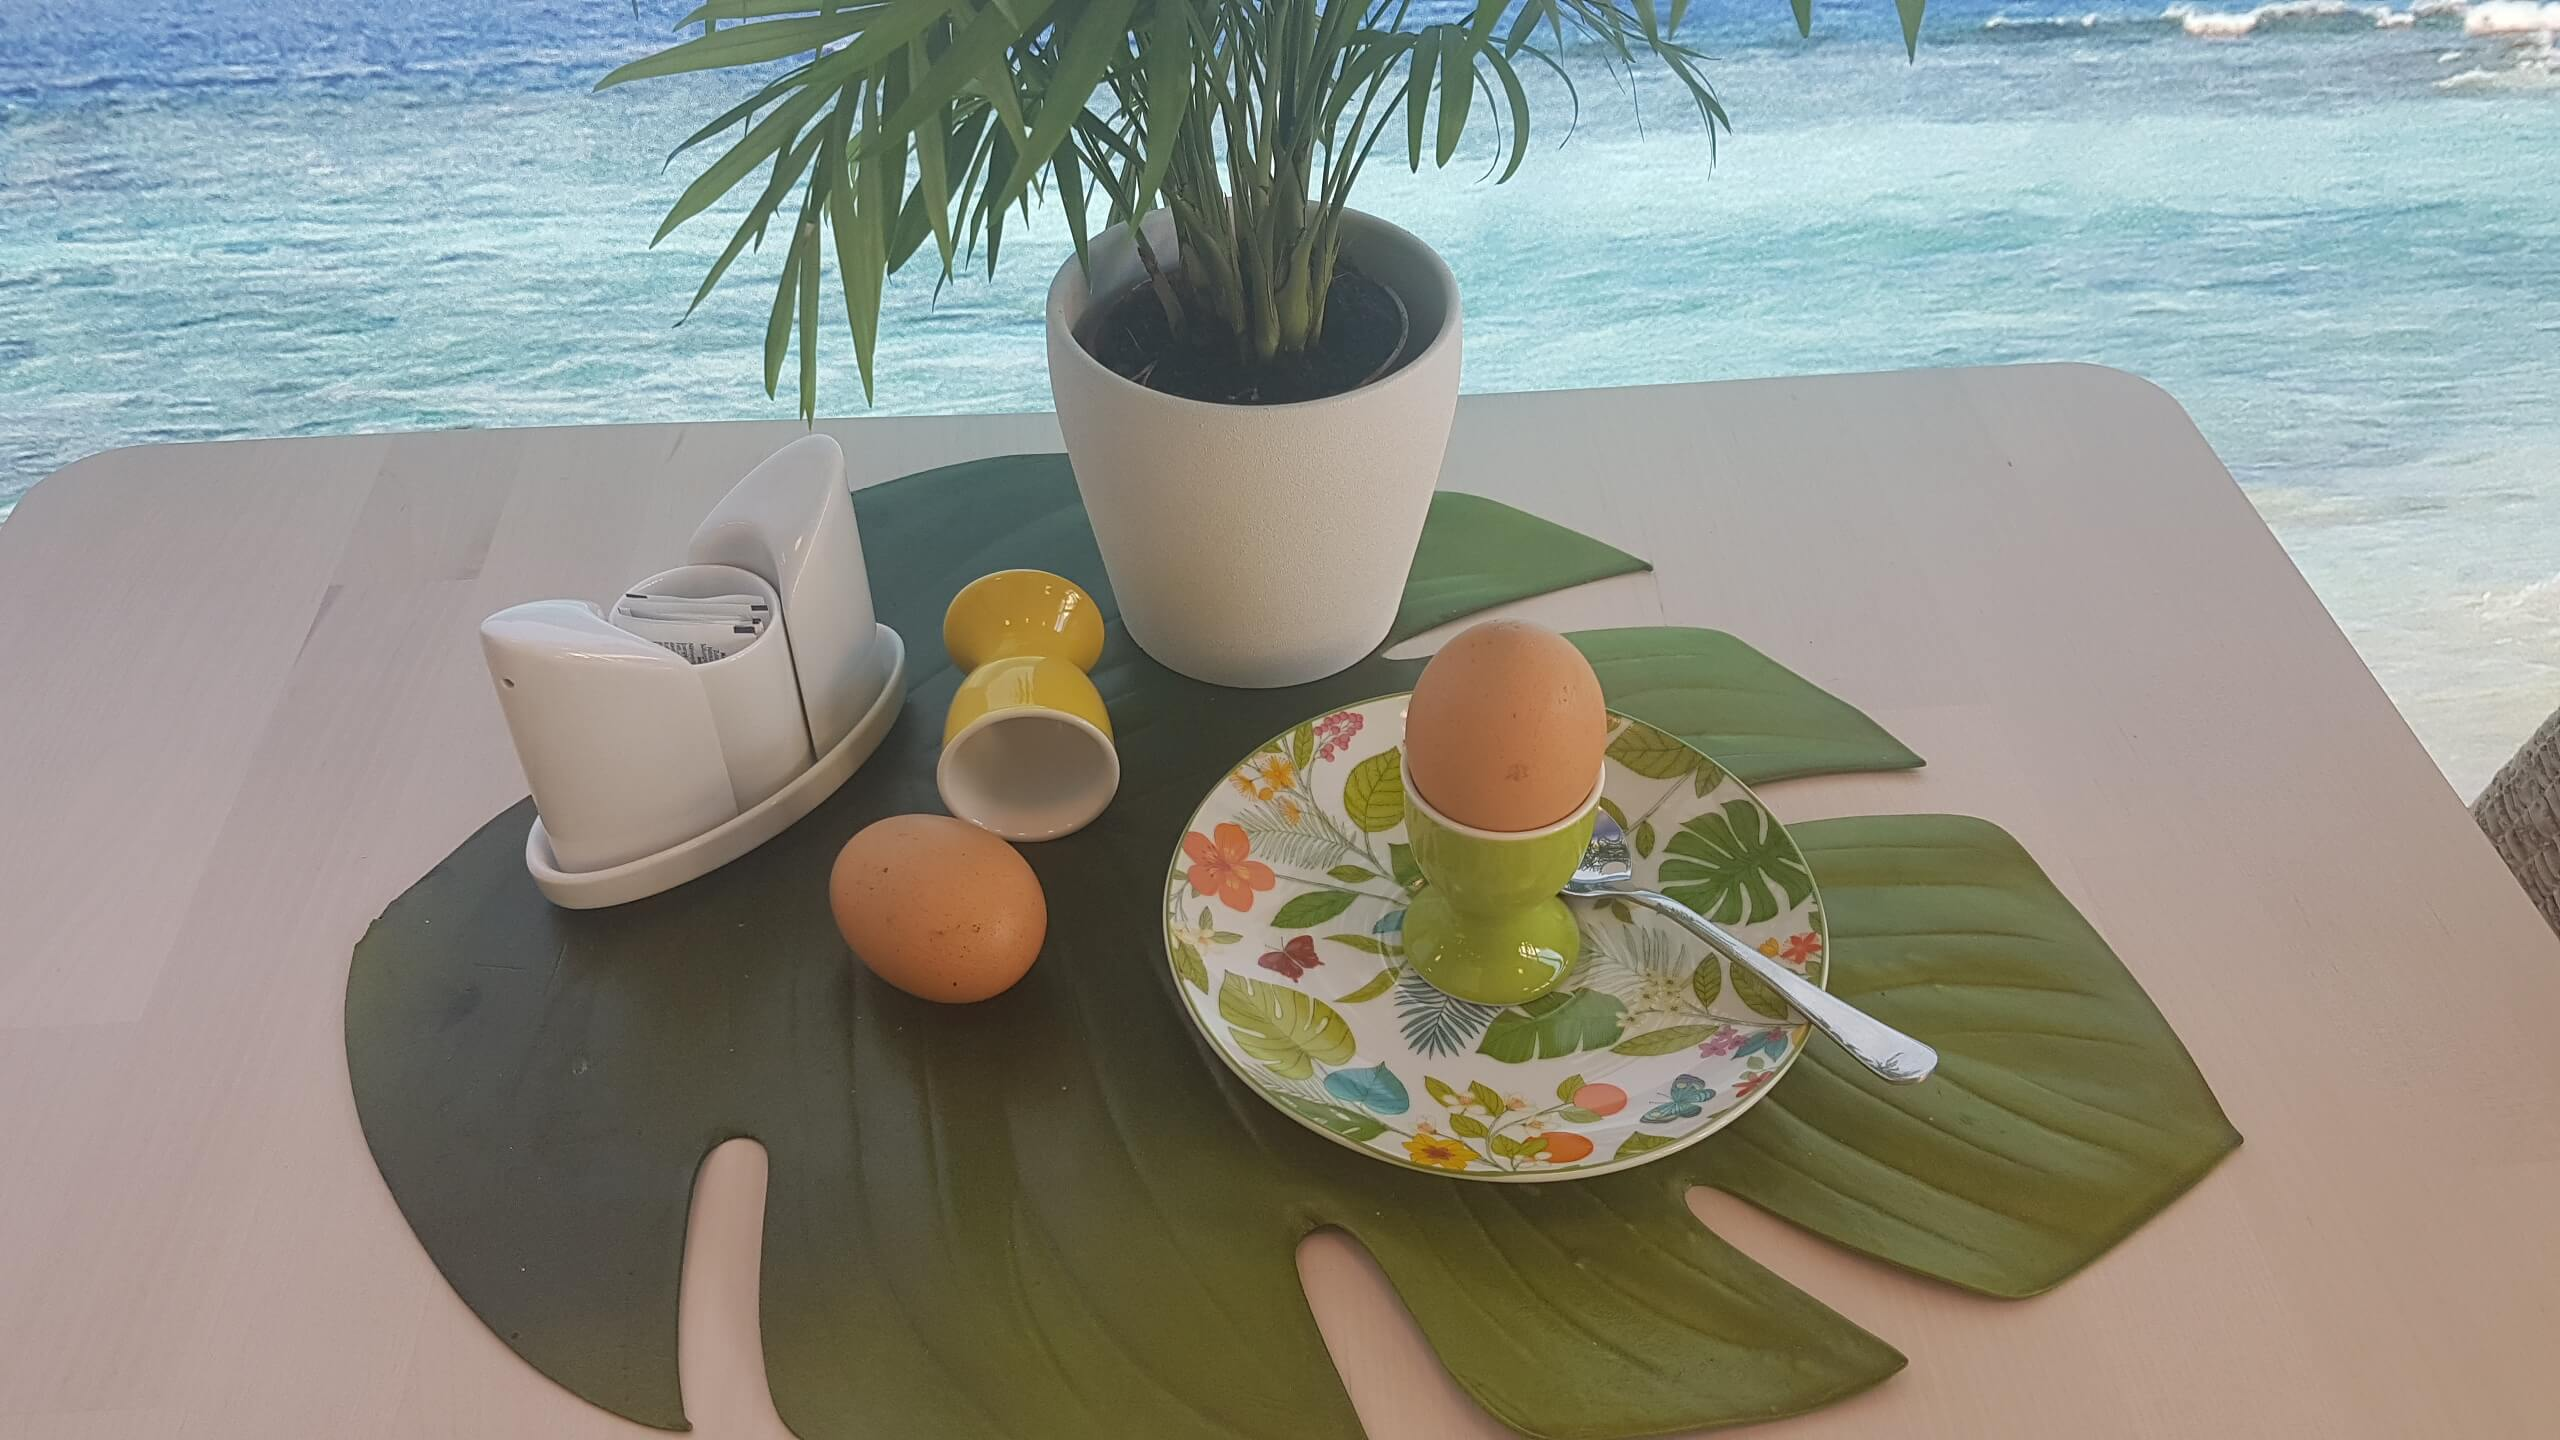 einfaches Ei Freilandhaltung Cafe Yellowbrasil